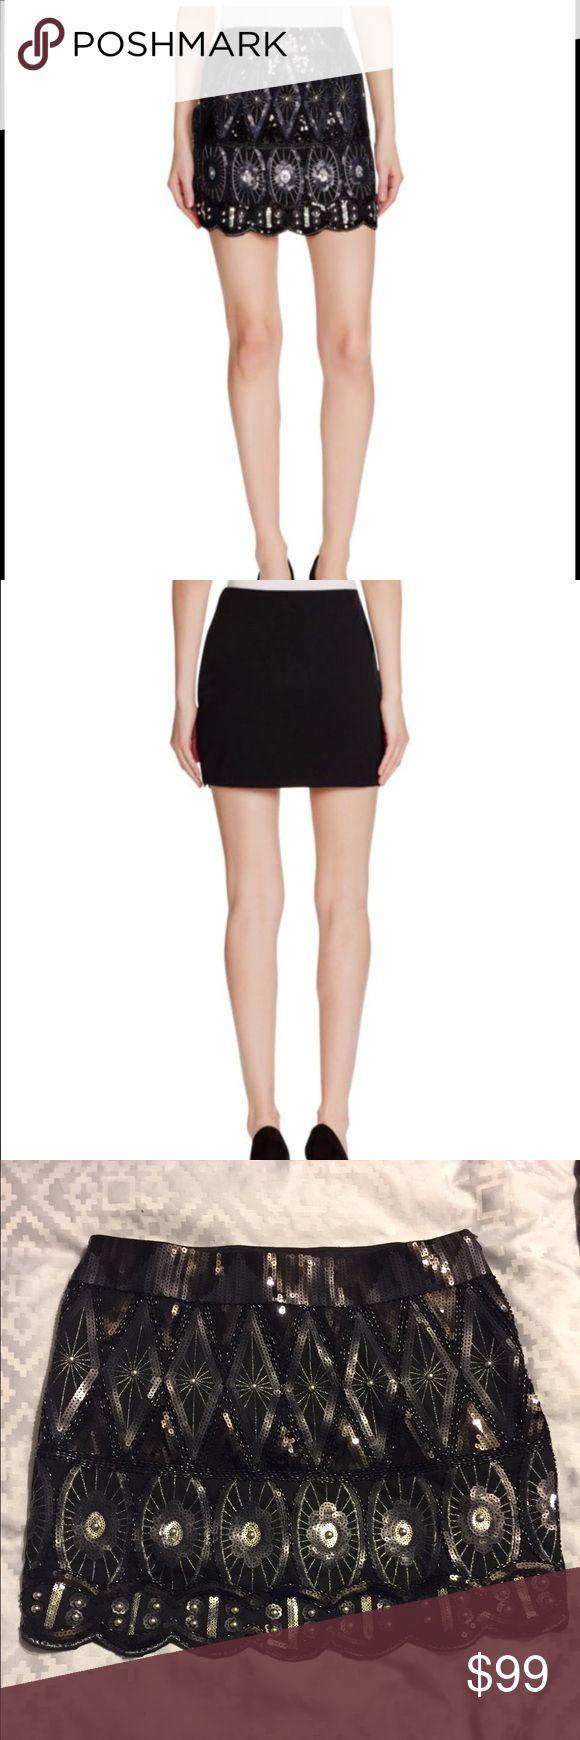 Sequin mini skirt Amazingly beautiful sequin mini skirt. Brand new!!!! Romeo & Juliet Couture Skirts